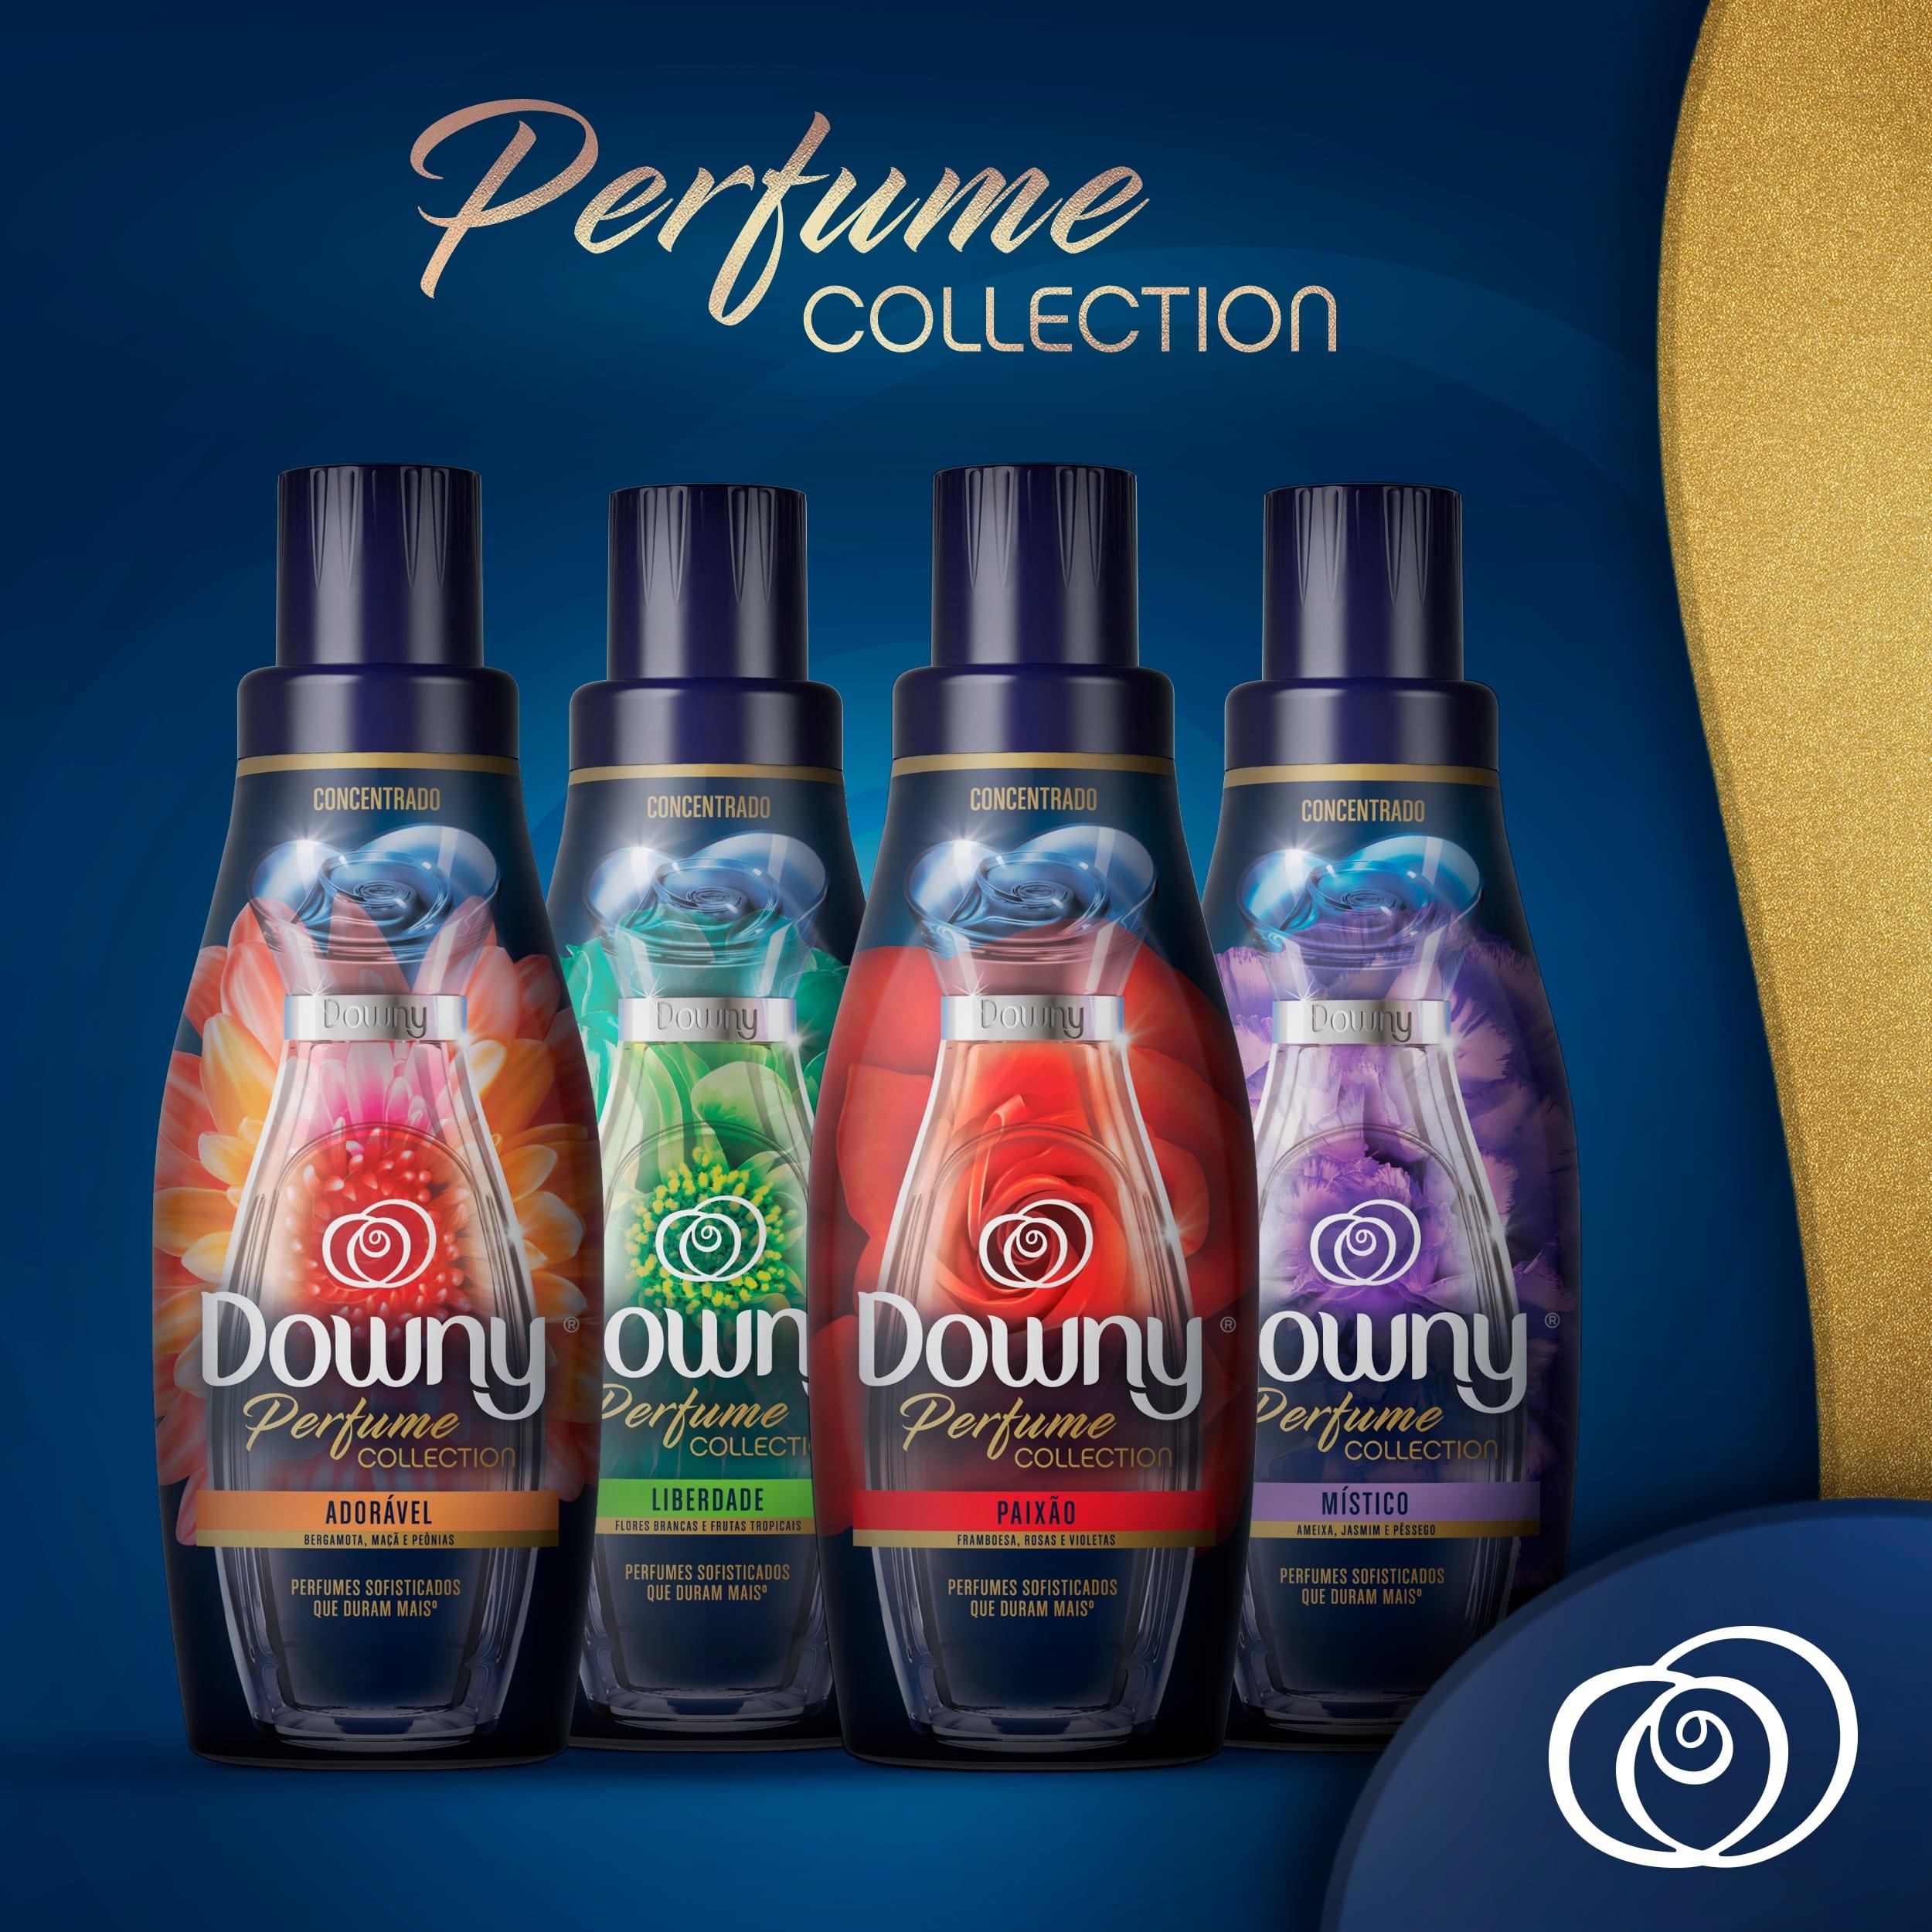 Amaciante Downy Perfume Collection Adorável Secondary 04